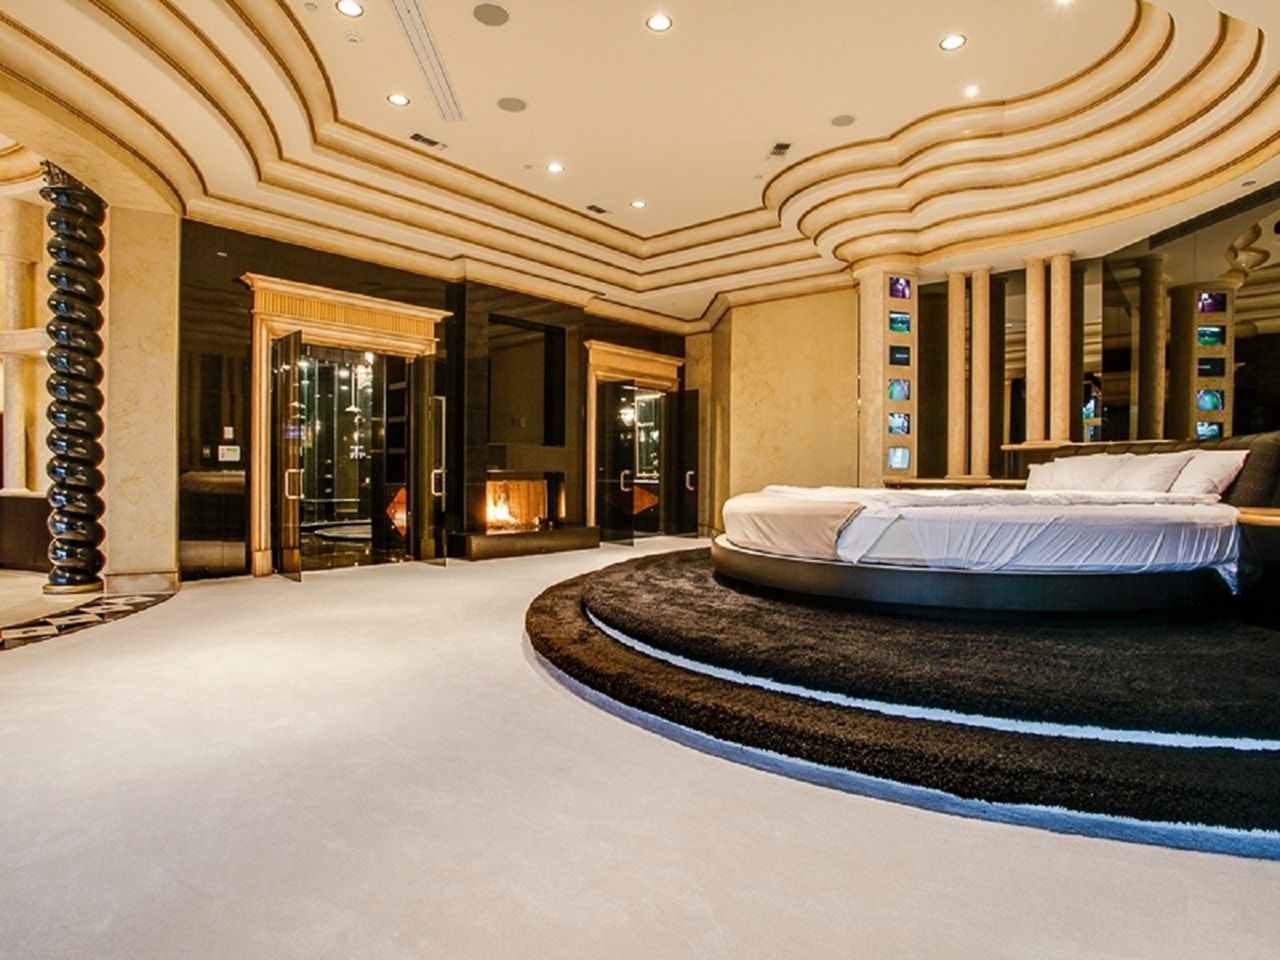 extraordinary 35 luxurious master bedroom designs for on dreamy luxurious master bedroom designs and decor ideas id=28030